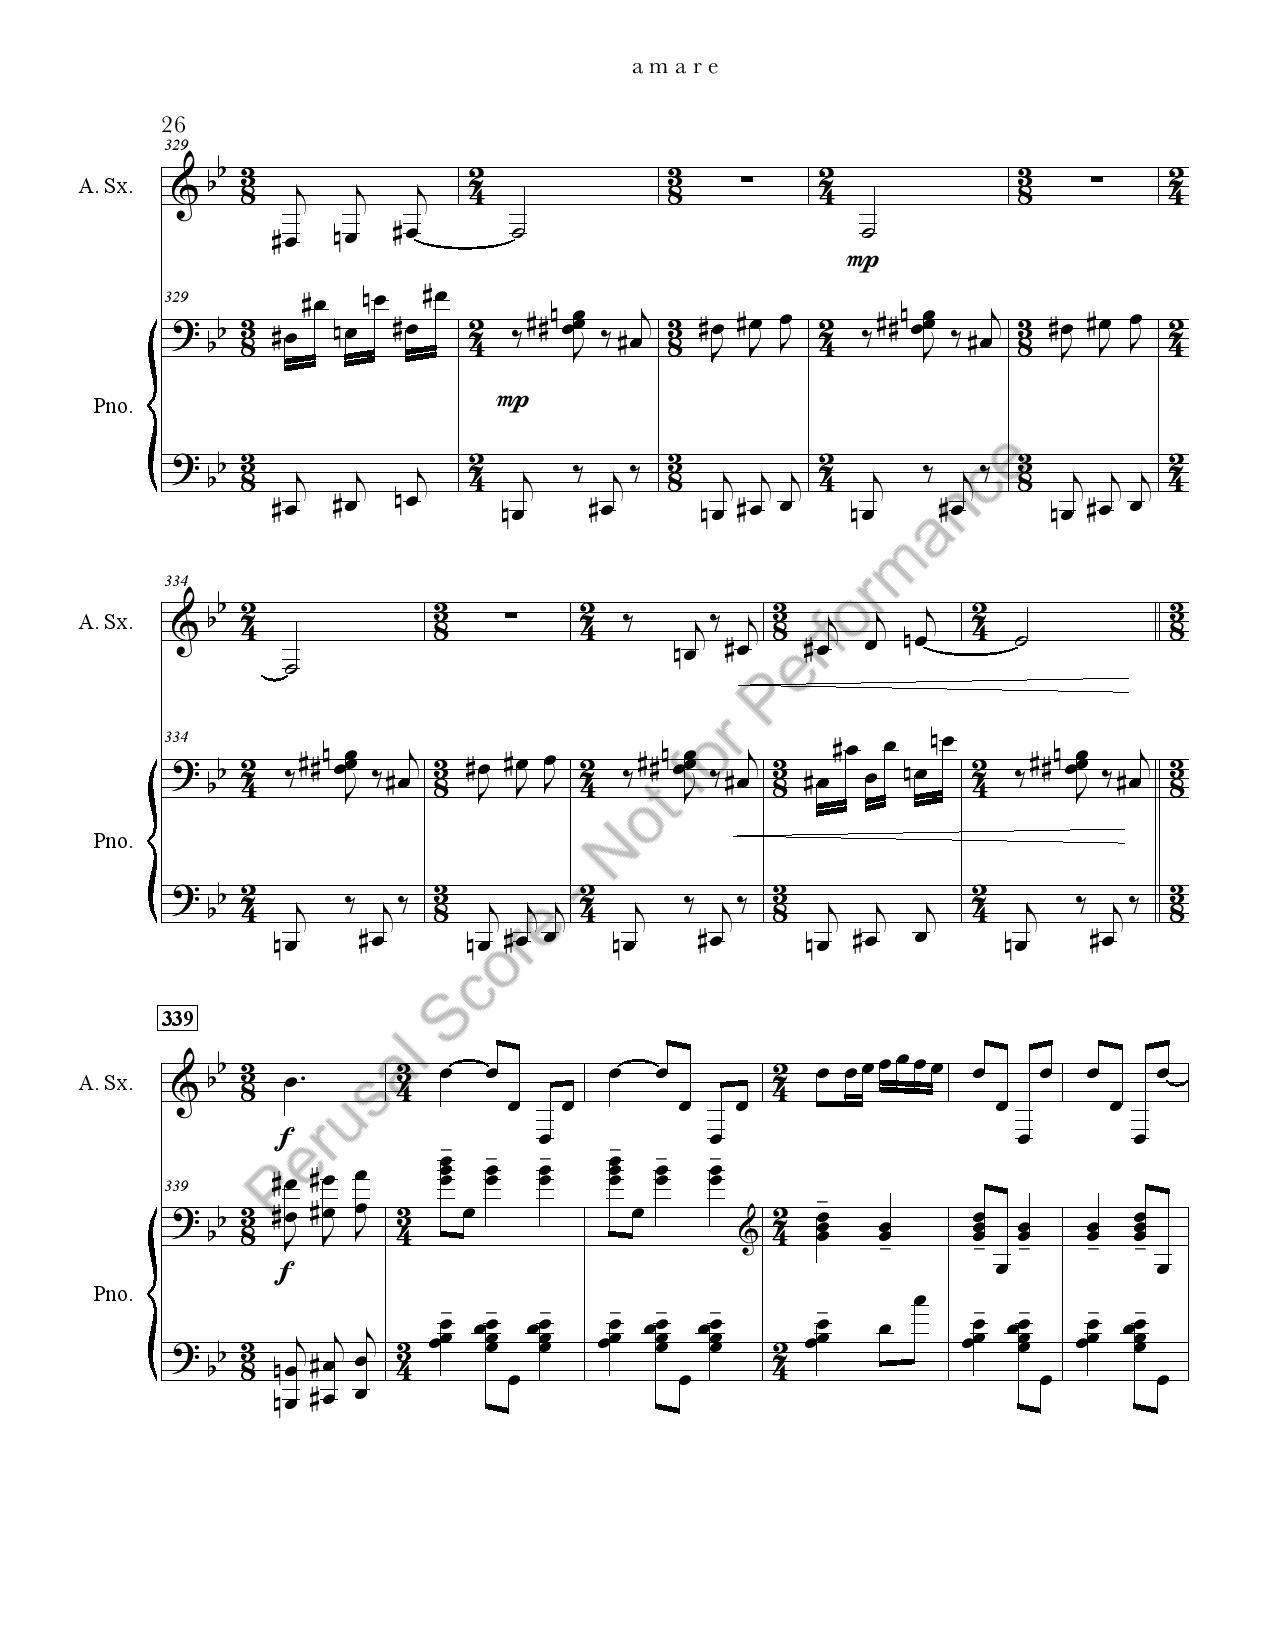 Boyd Amare Score_watermark-3-page-032.jpg